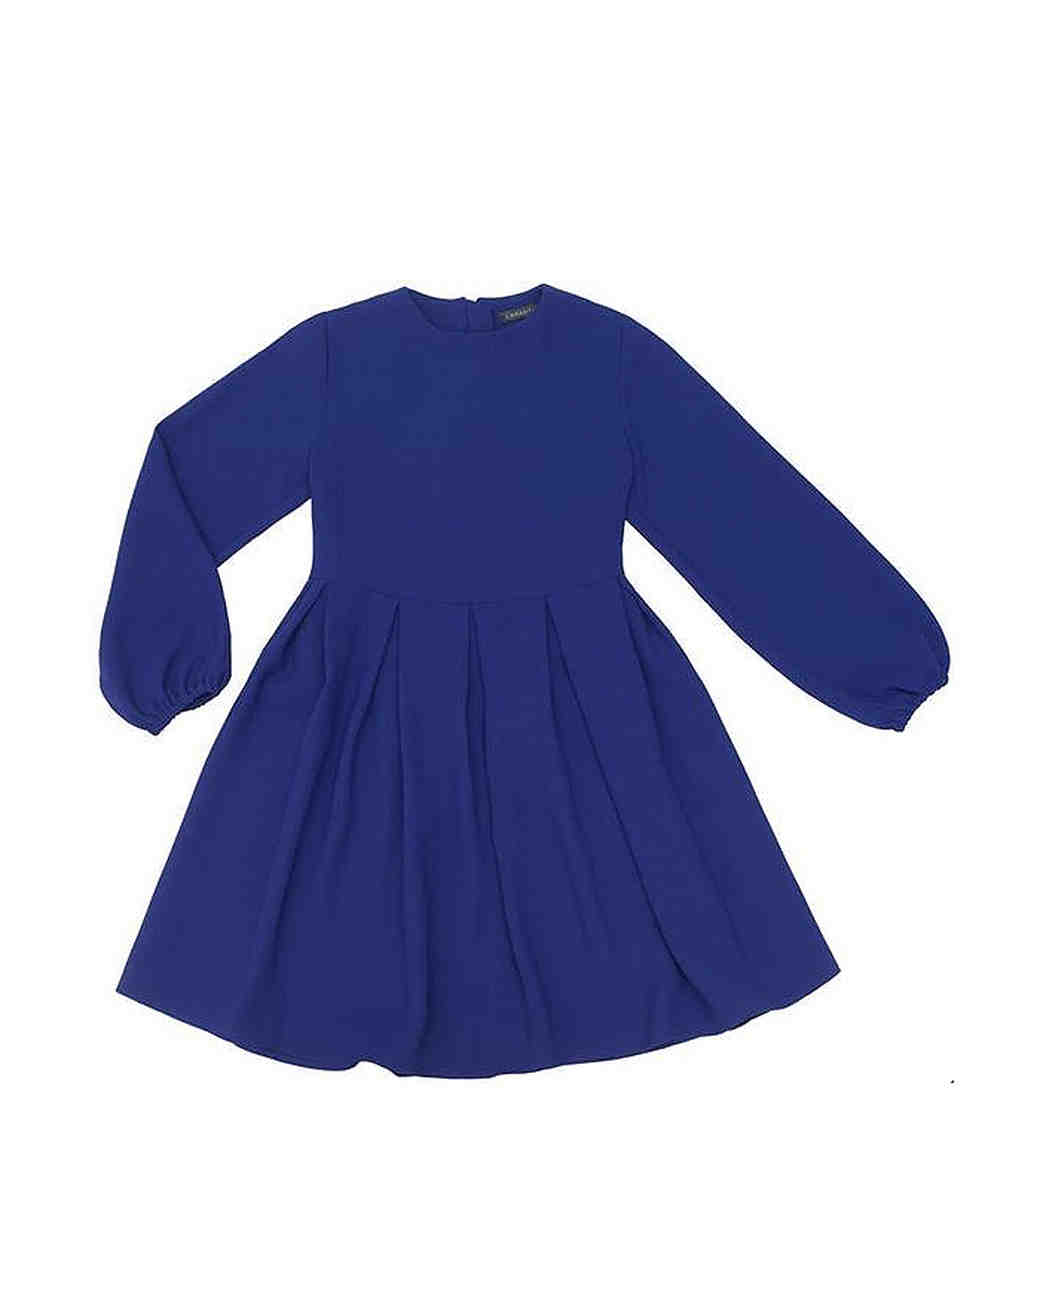 flower-girl-dresses-shan-and-toad-minos-blue-dress-0216.jpg